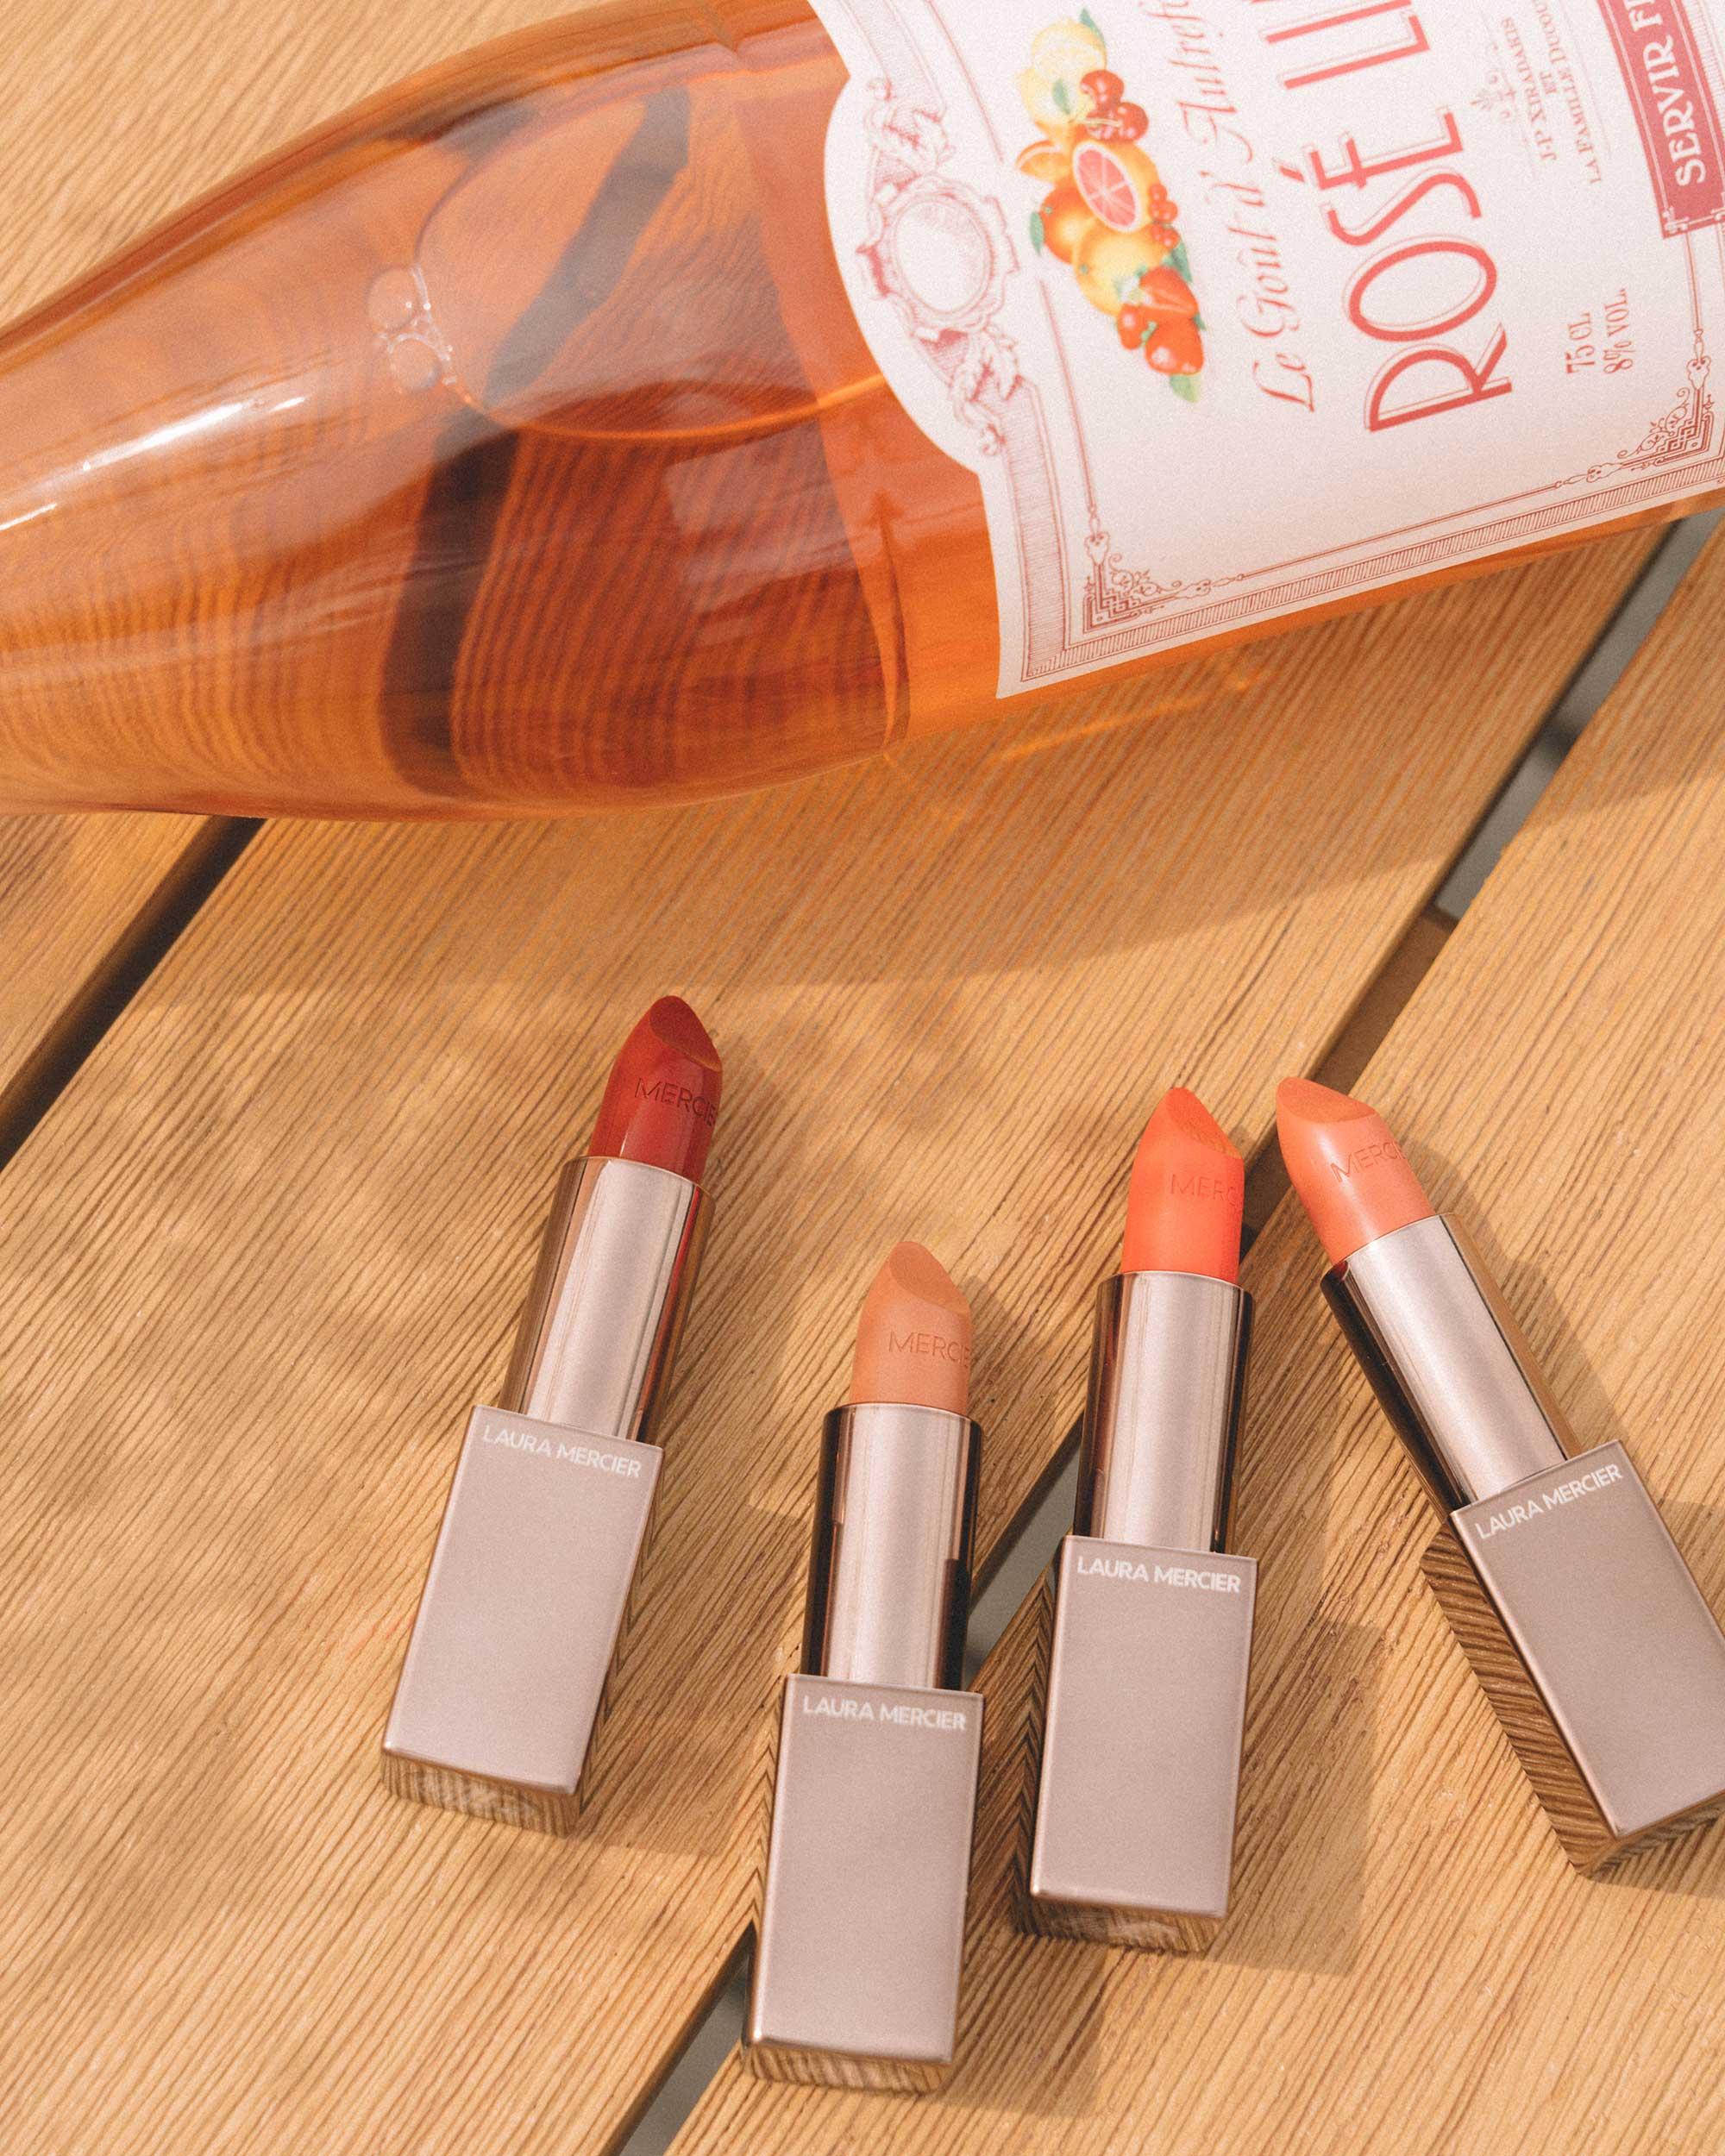 Rouge Essential Silky Creme Lipstick - Laura Mercier Rouge Essential Silky Creme Lipstick in Rouge Profound, Brun Pale, L'Orange, & Nude Nouveau (left to right) for intense summer color